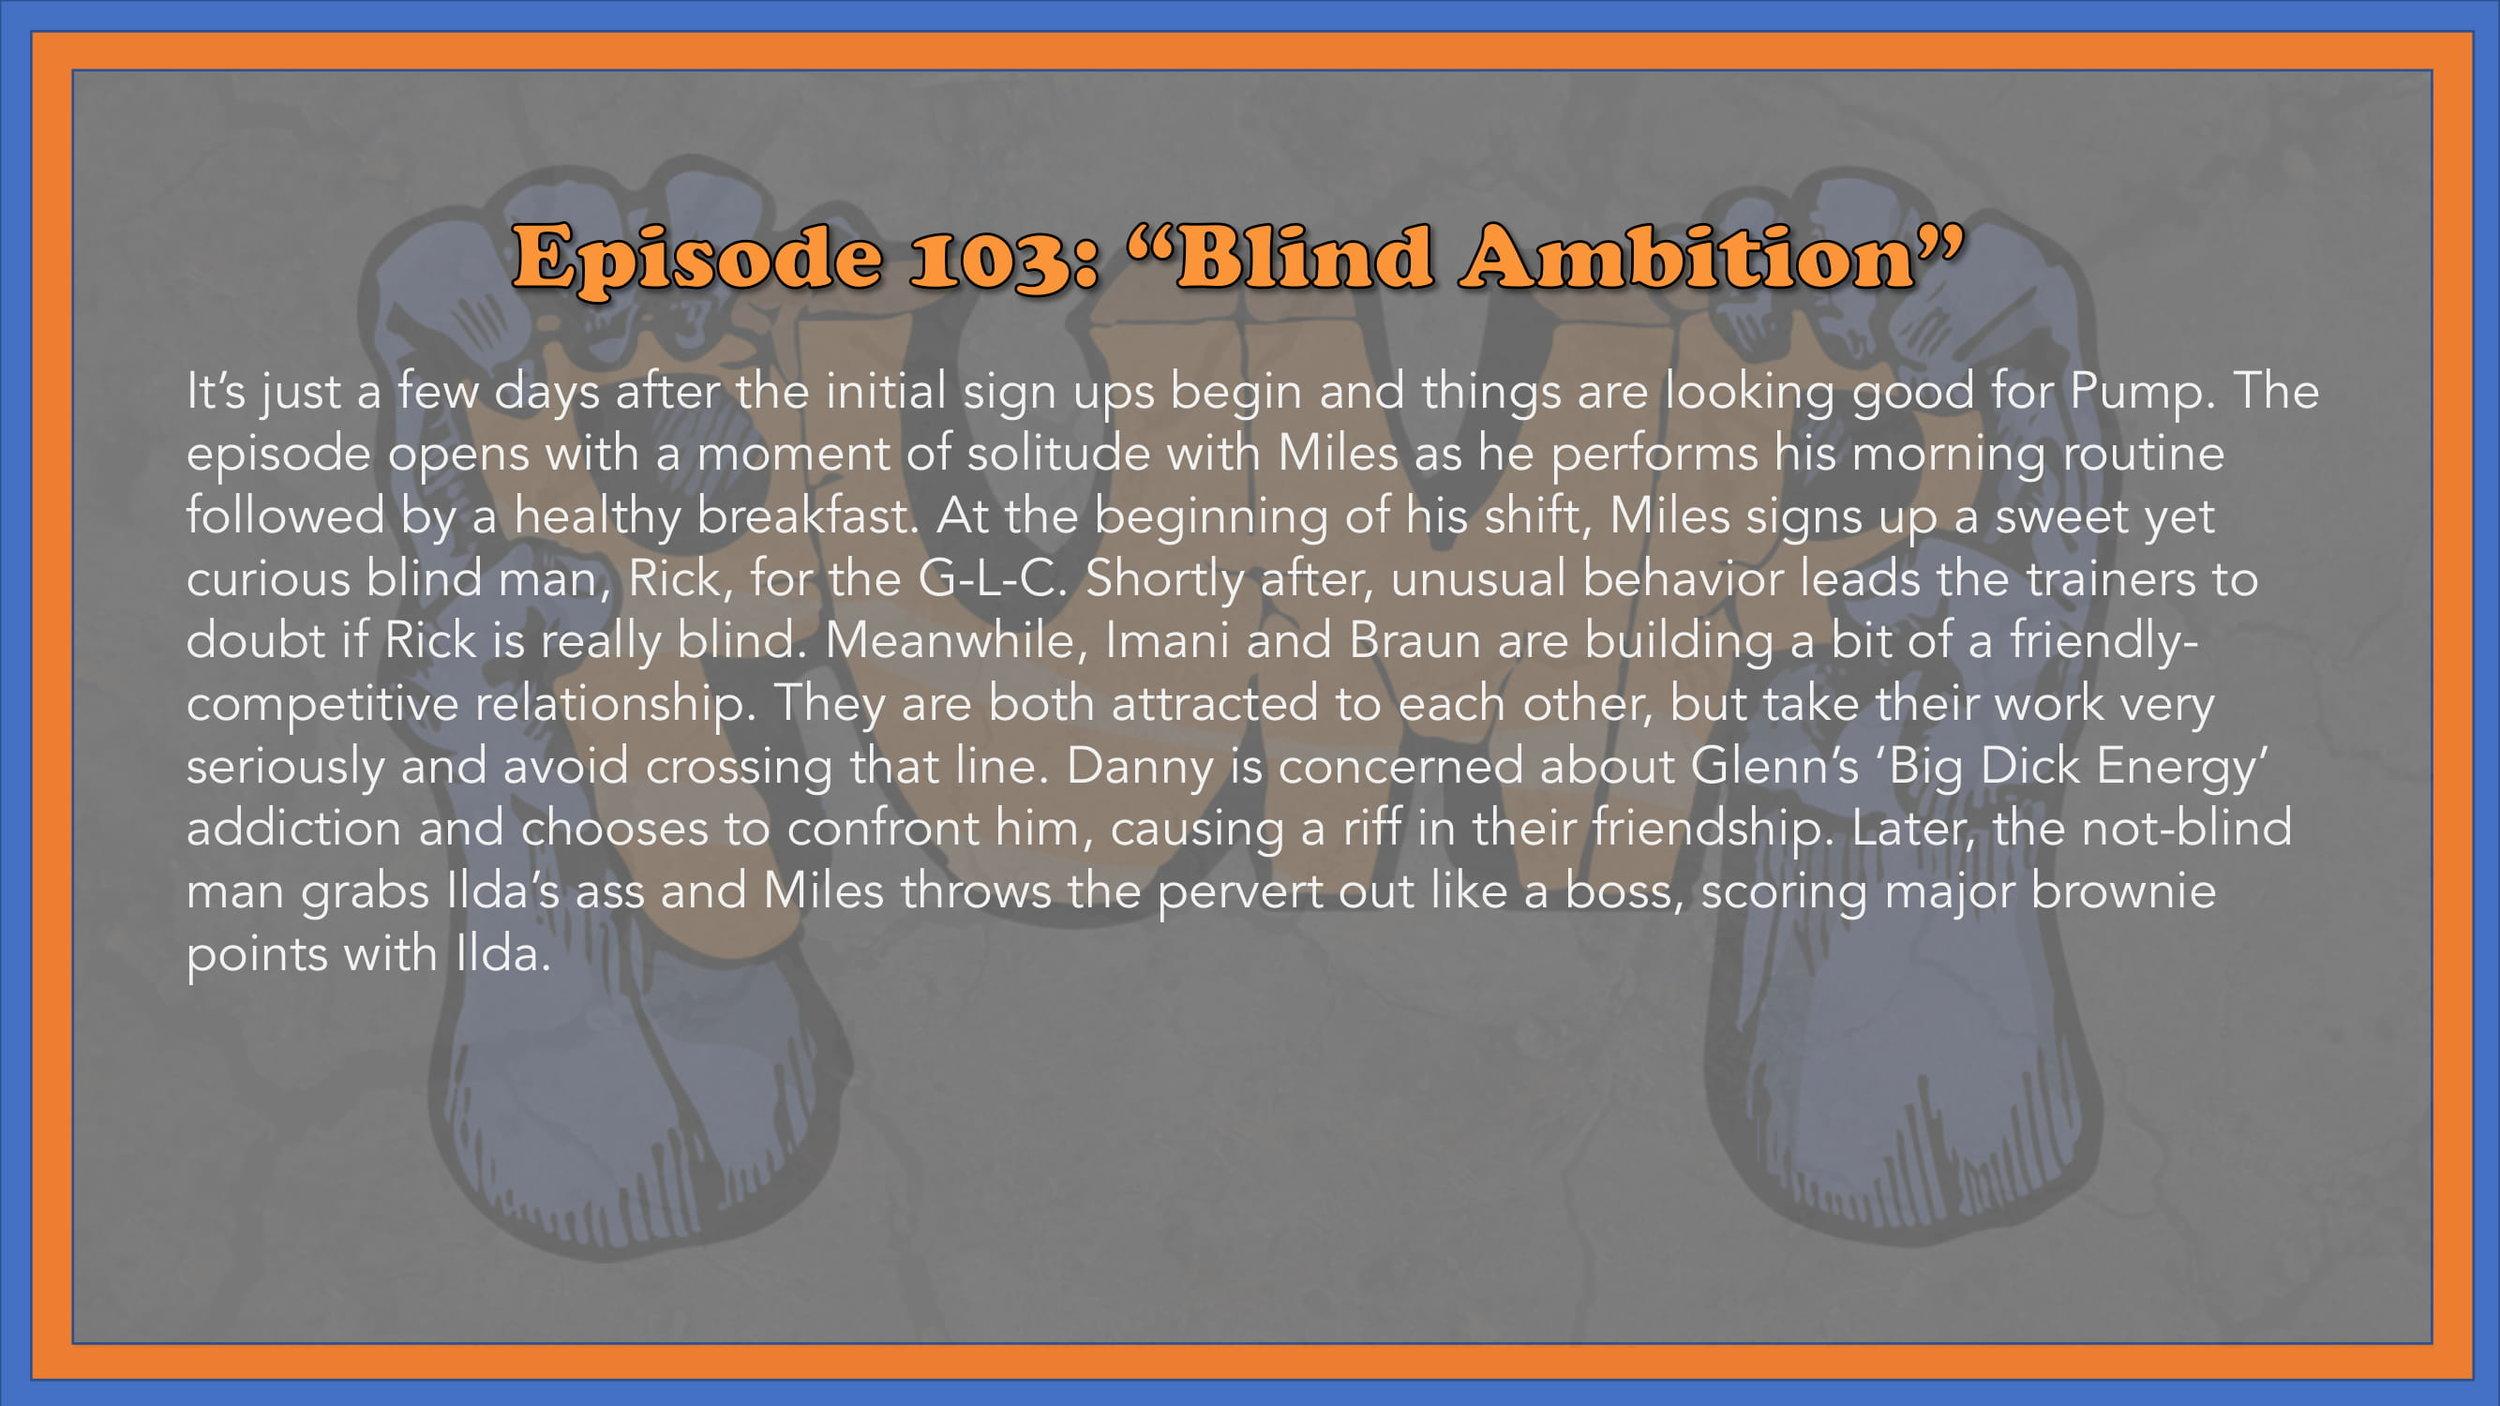 Pump Episode Outlines Season One 120618-4.jpg